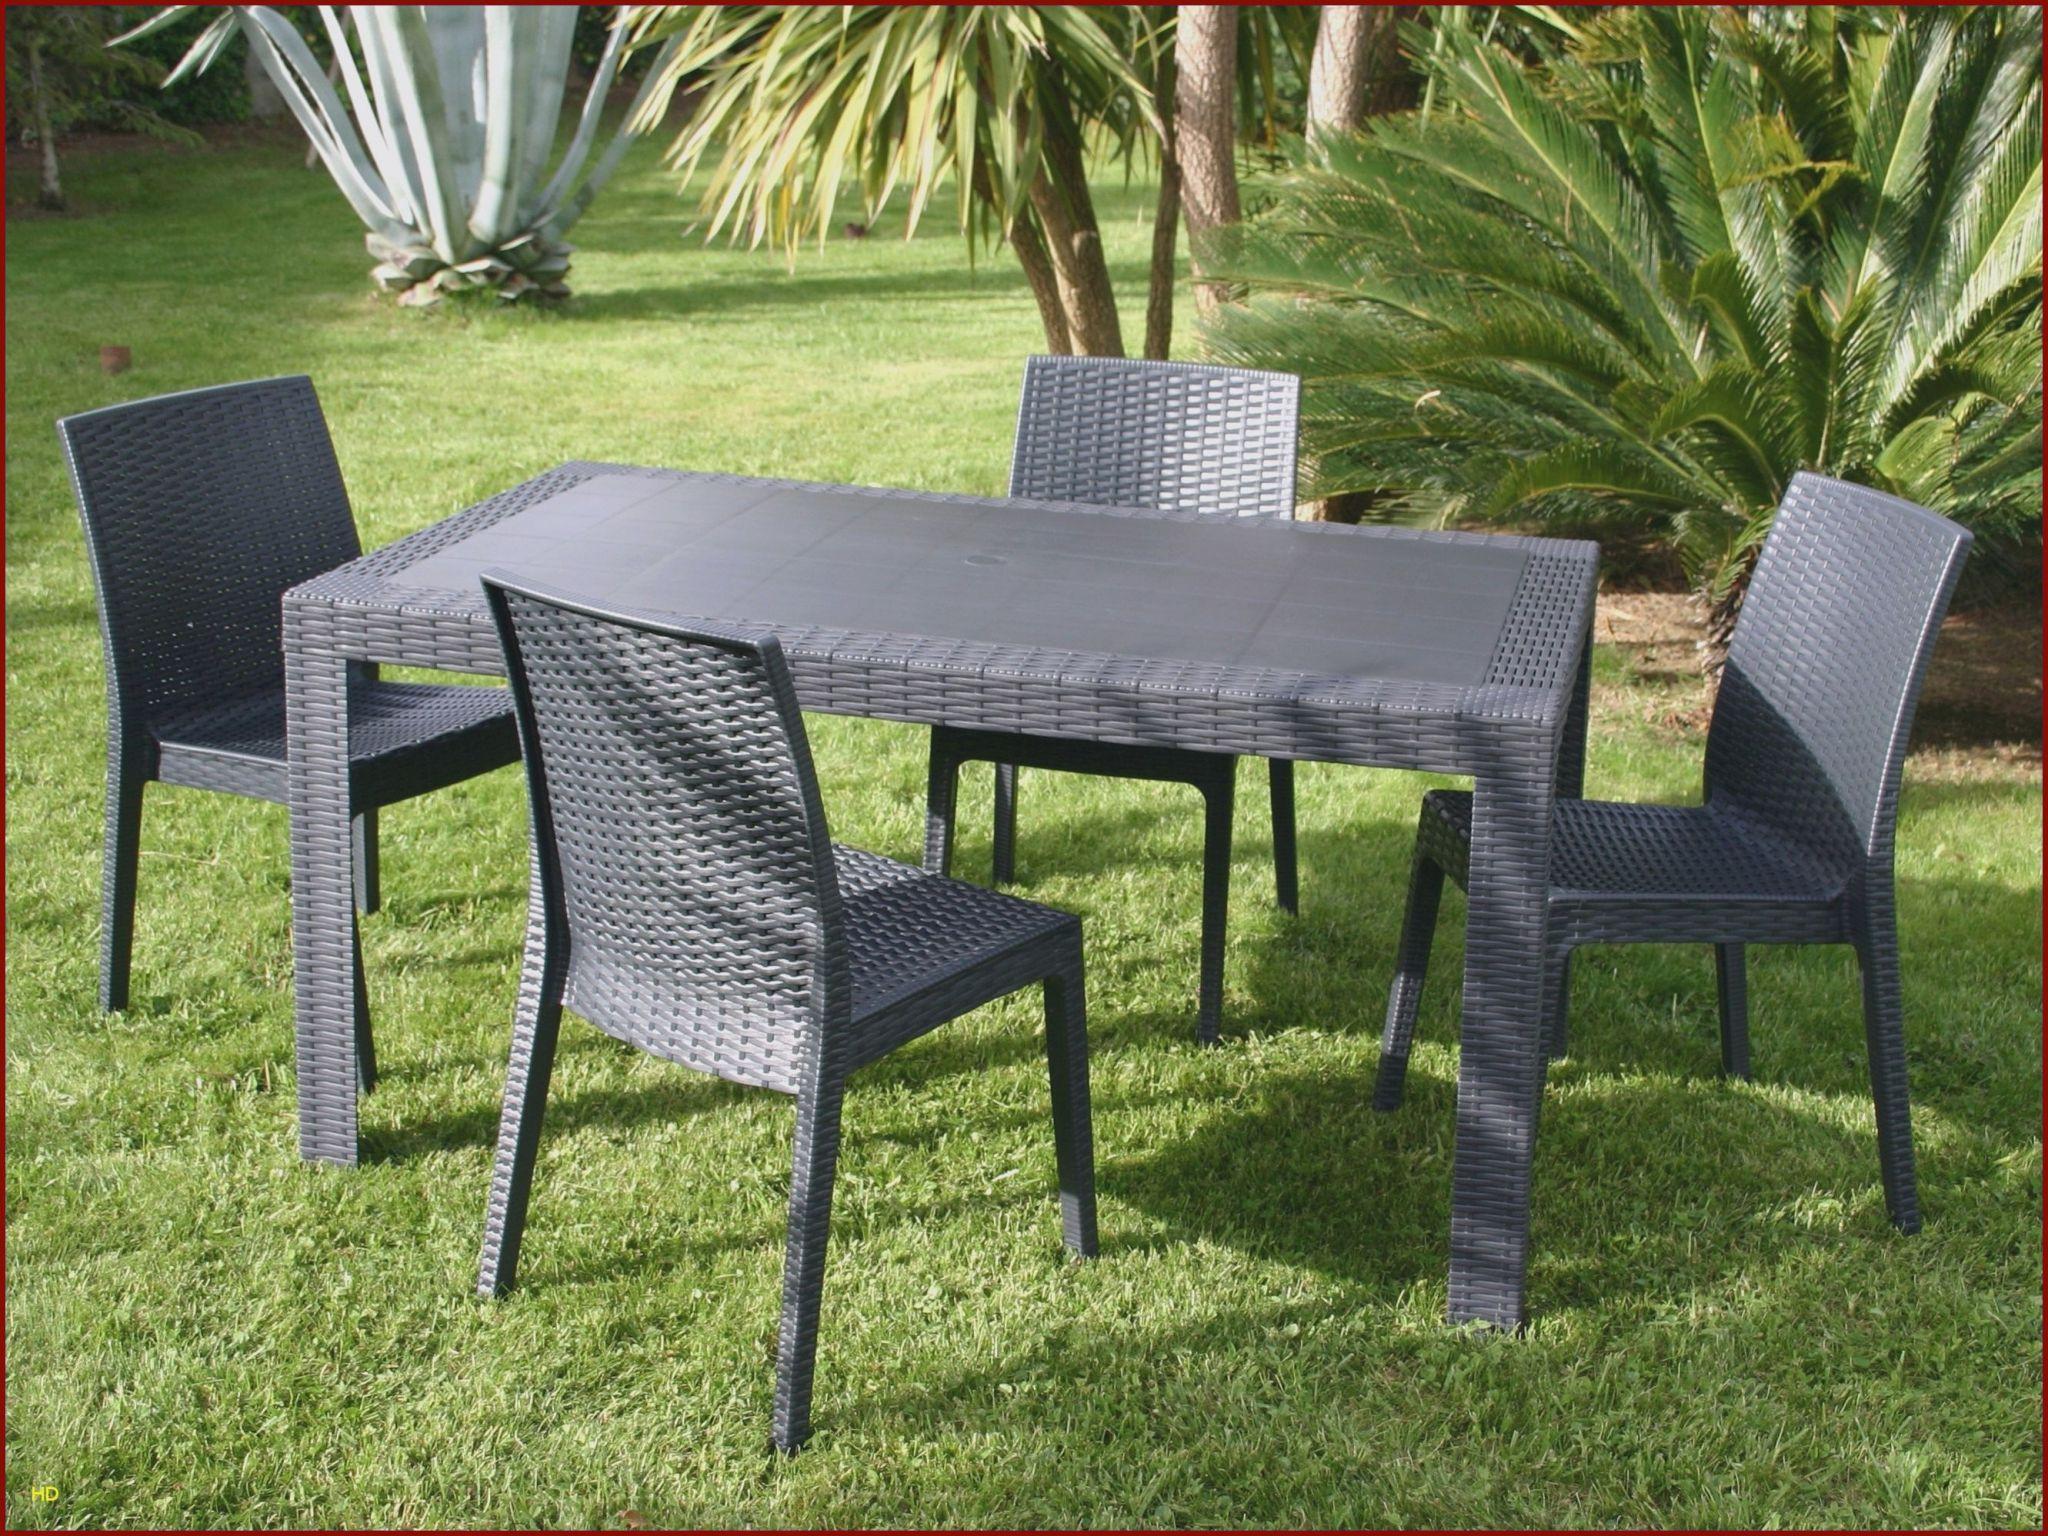 table de jardin avec chaise pas cher chaises luxe chaise ice 0d table jardin resine lovely of table de jardin avec chaise pas cher